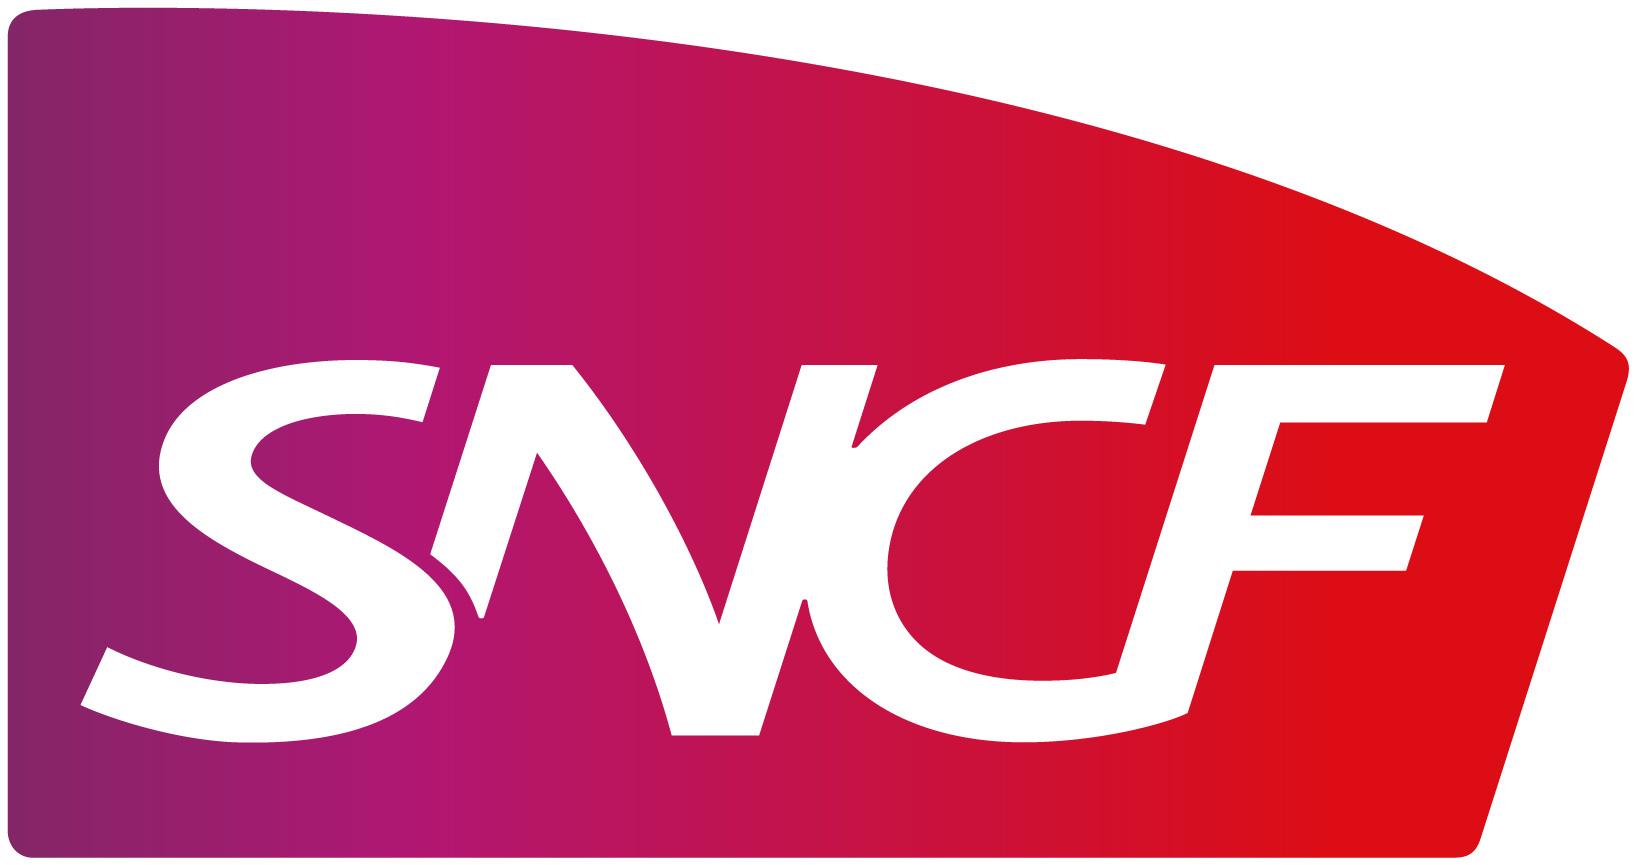 La SNCF choisit Atenao